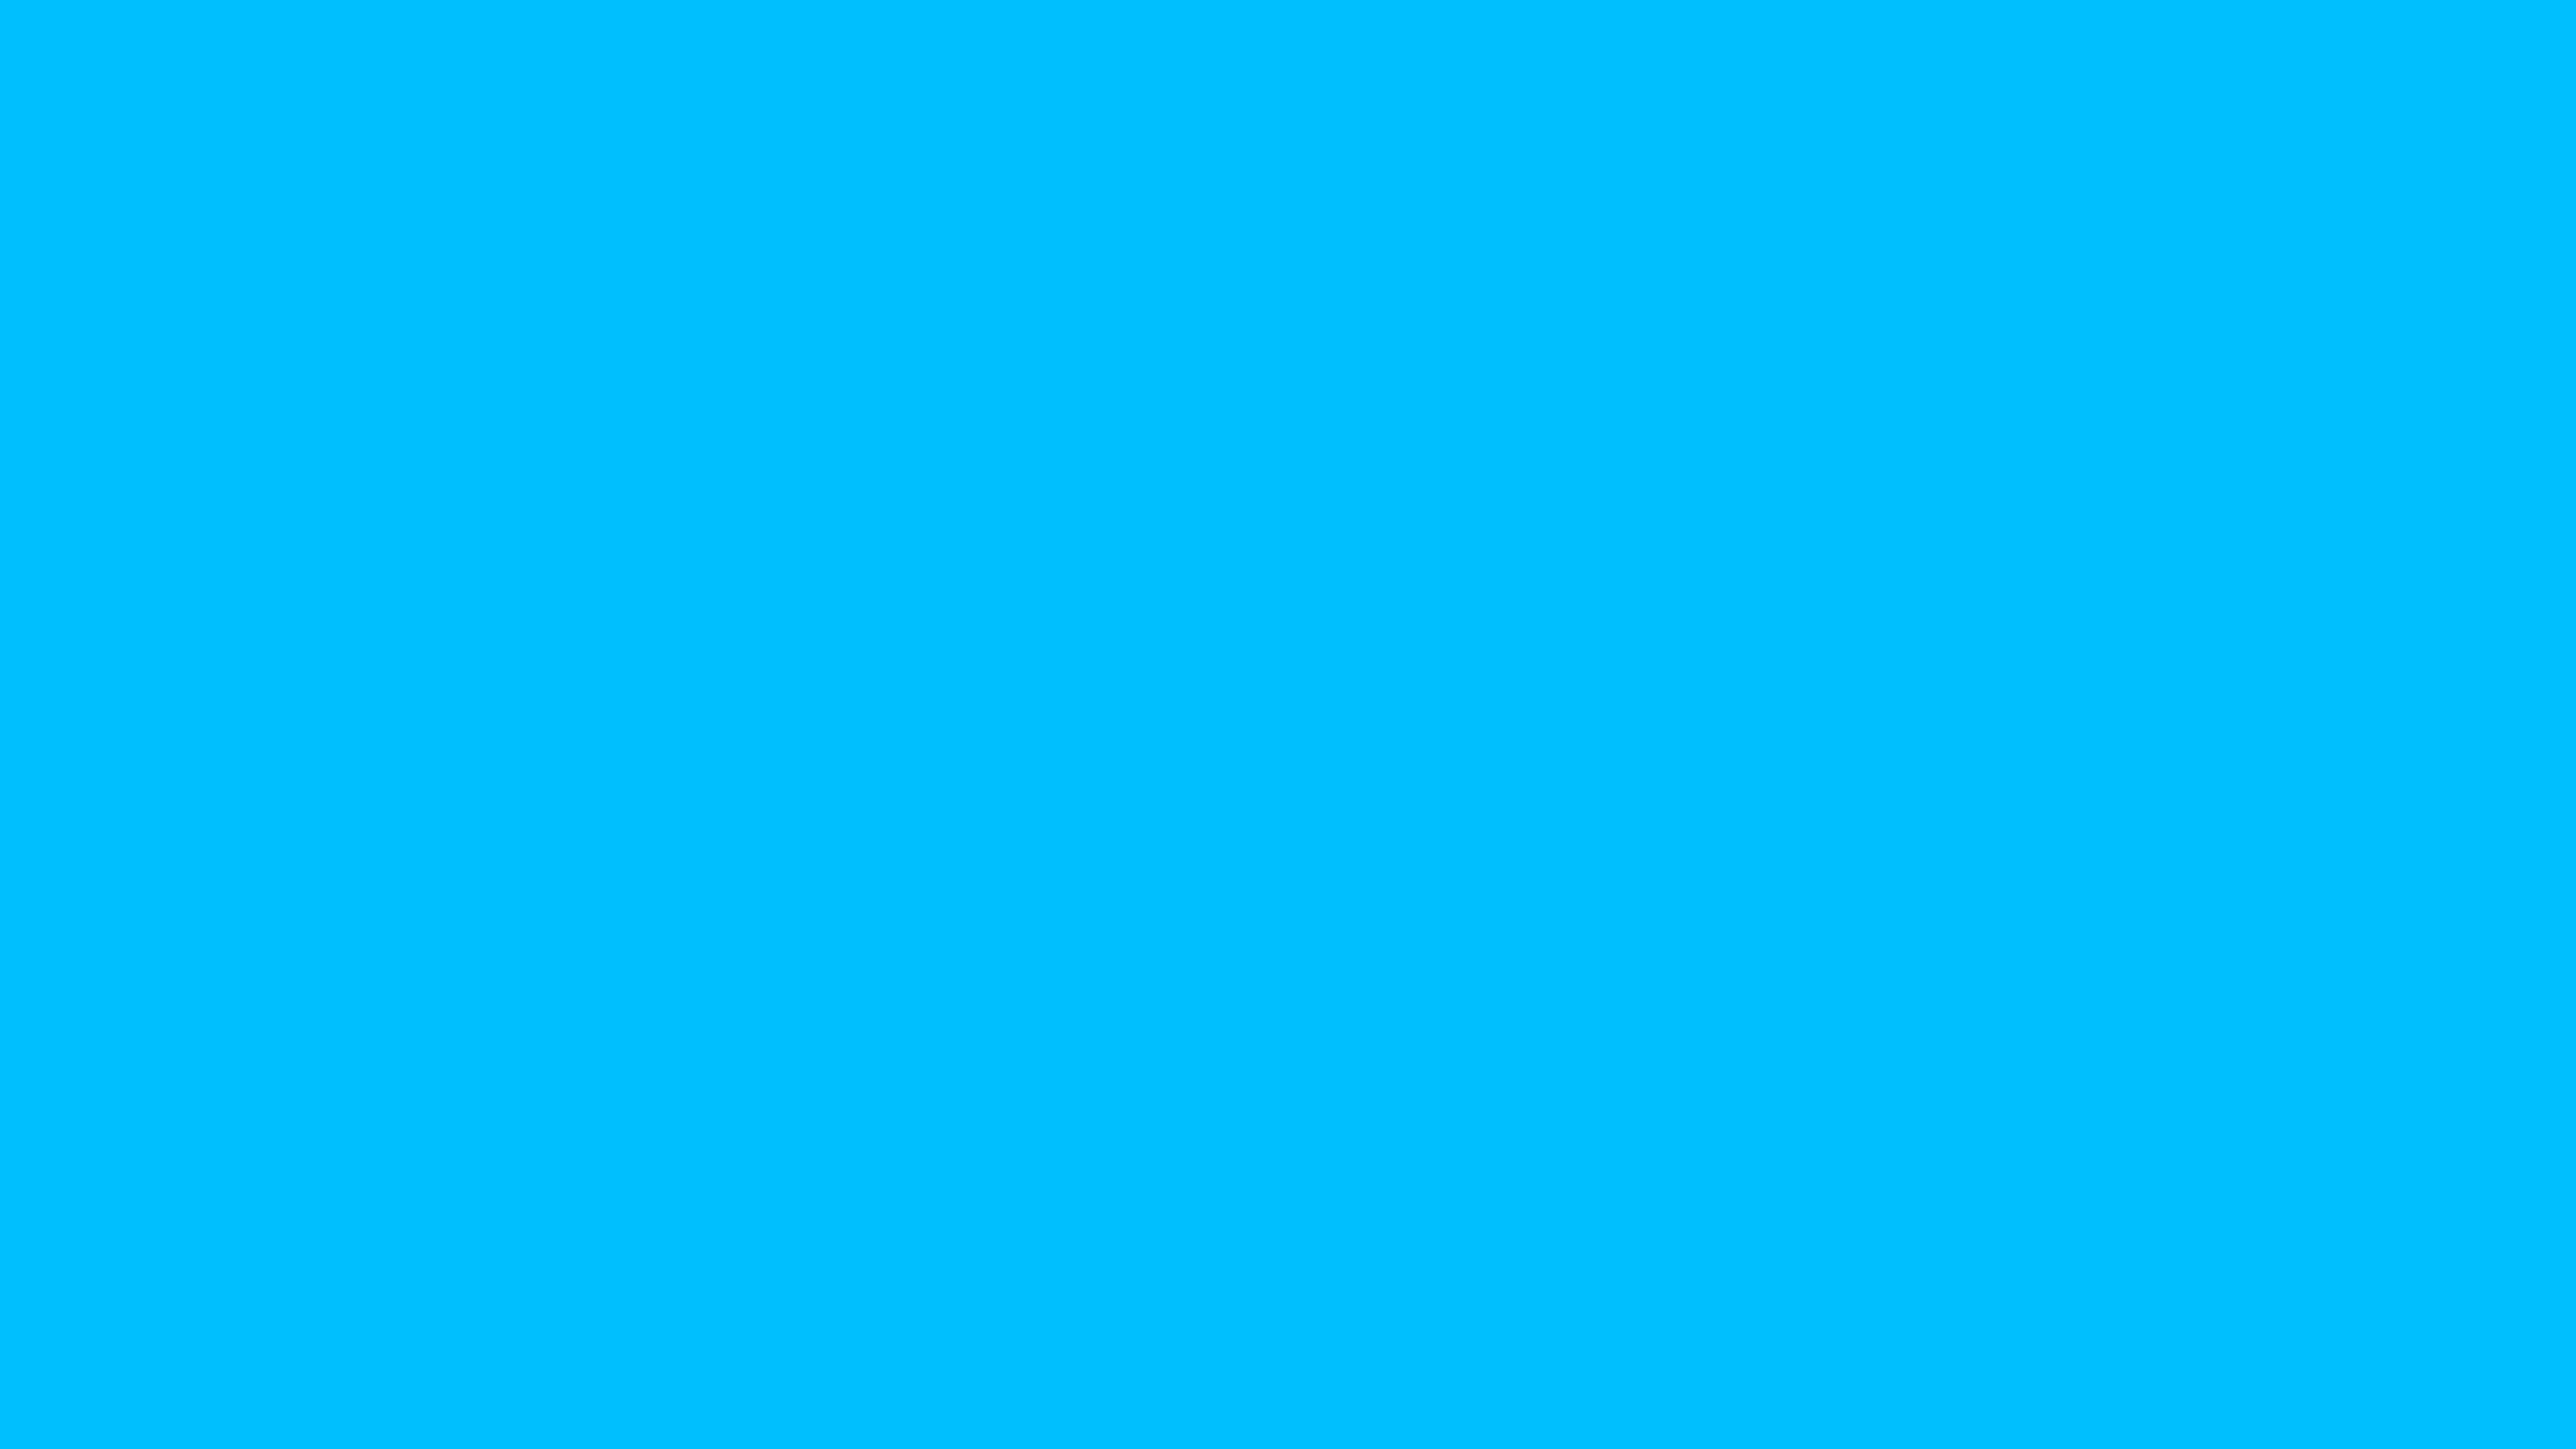 7680x4320 Capri Solid Color Background